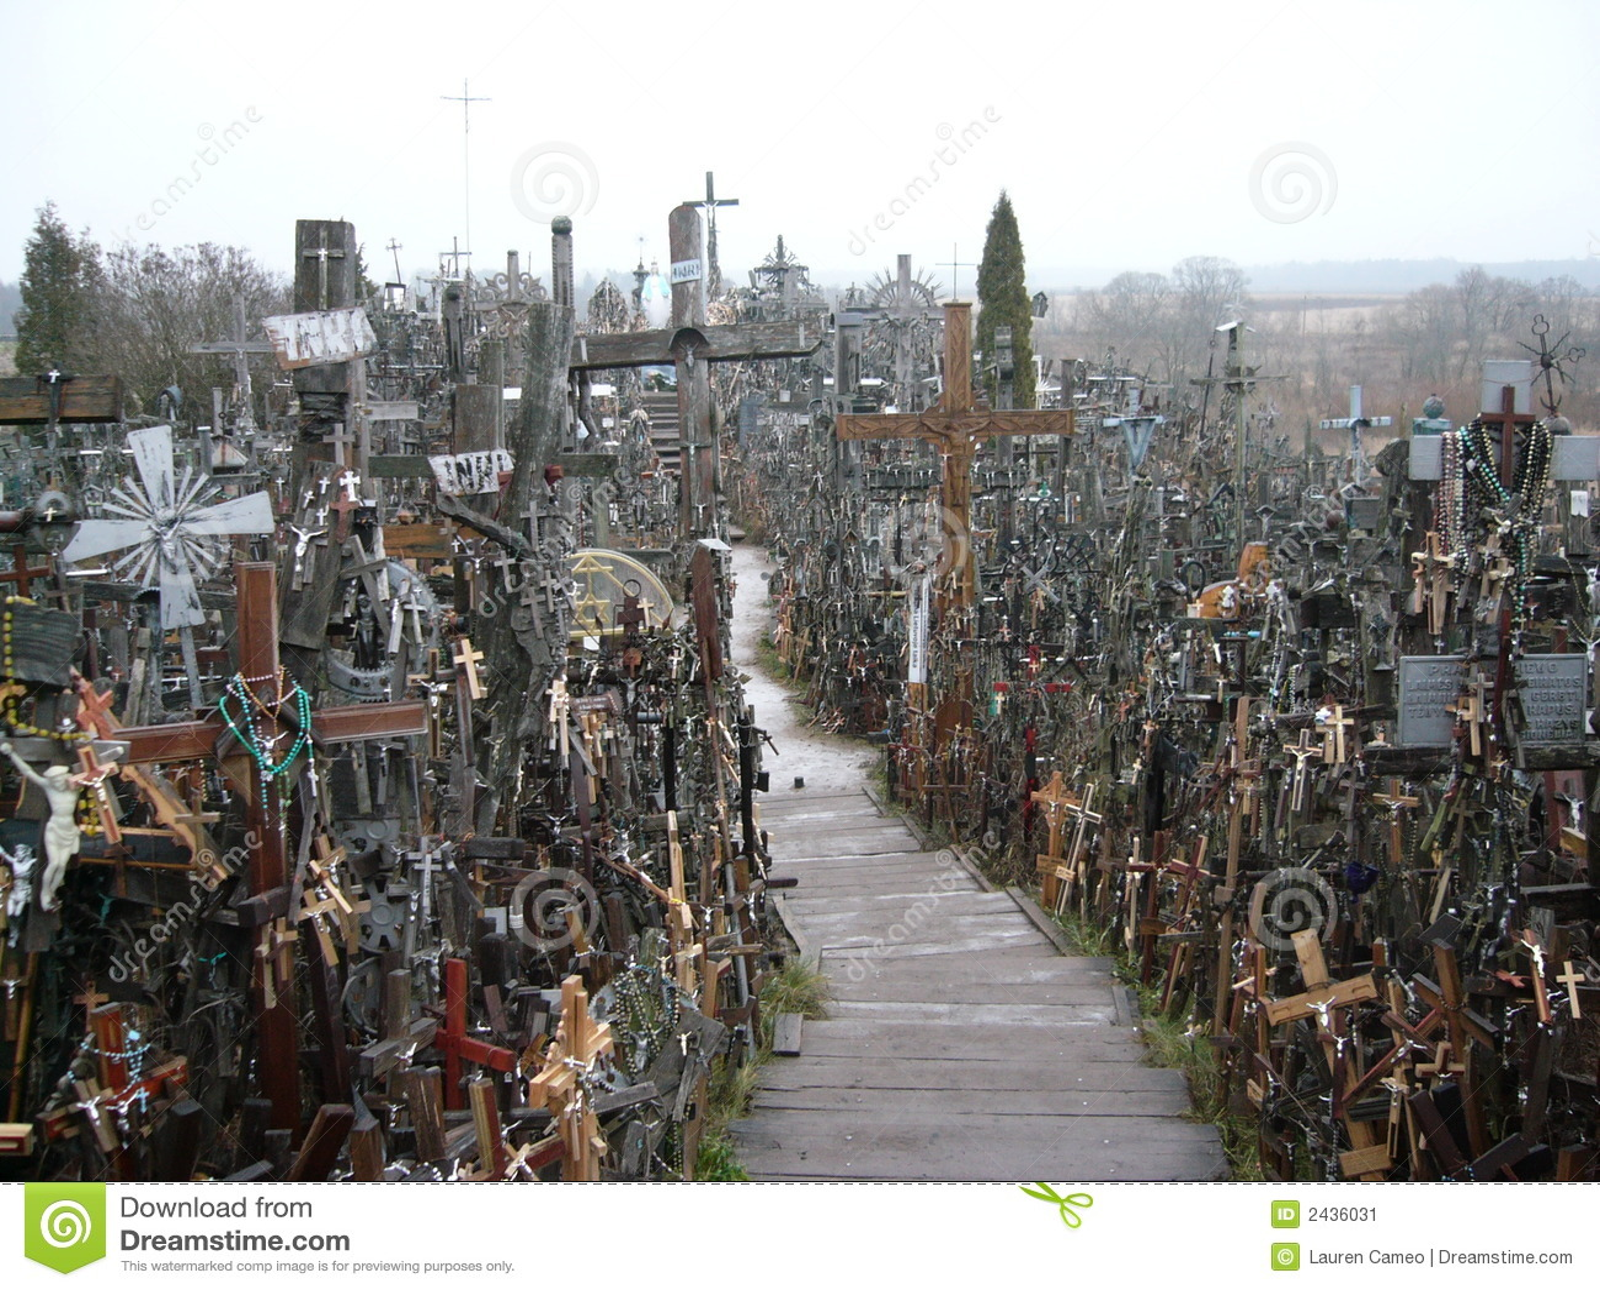 Castellammare del golfo sicily italy stock photo image 48782909 - Crosses At The Hill Of Crosses Siauliai Lithuania